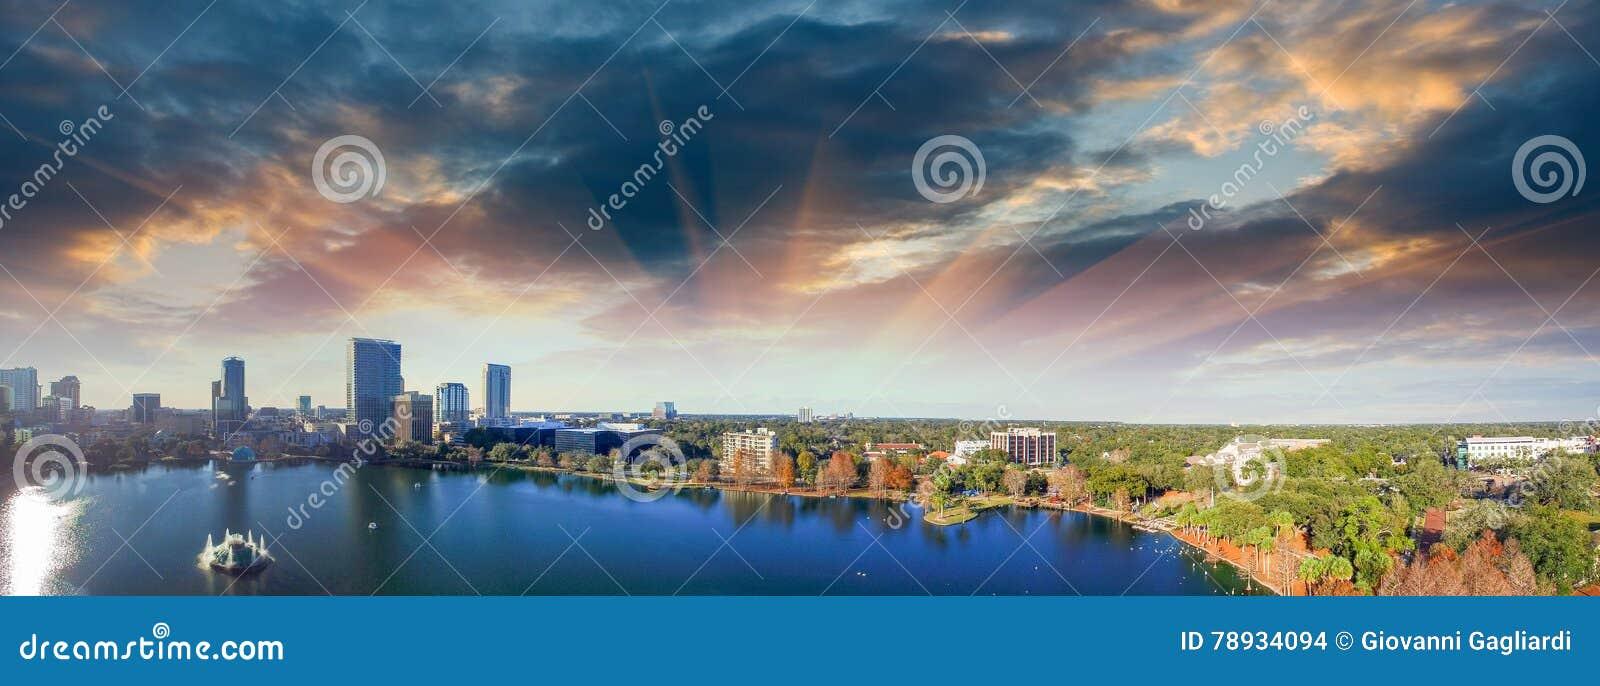 Orlando aerial view, skyline and Lake Eola at dusk